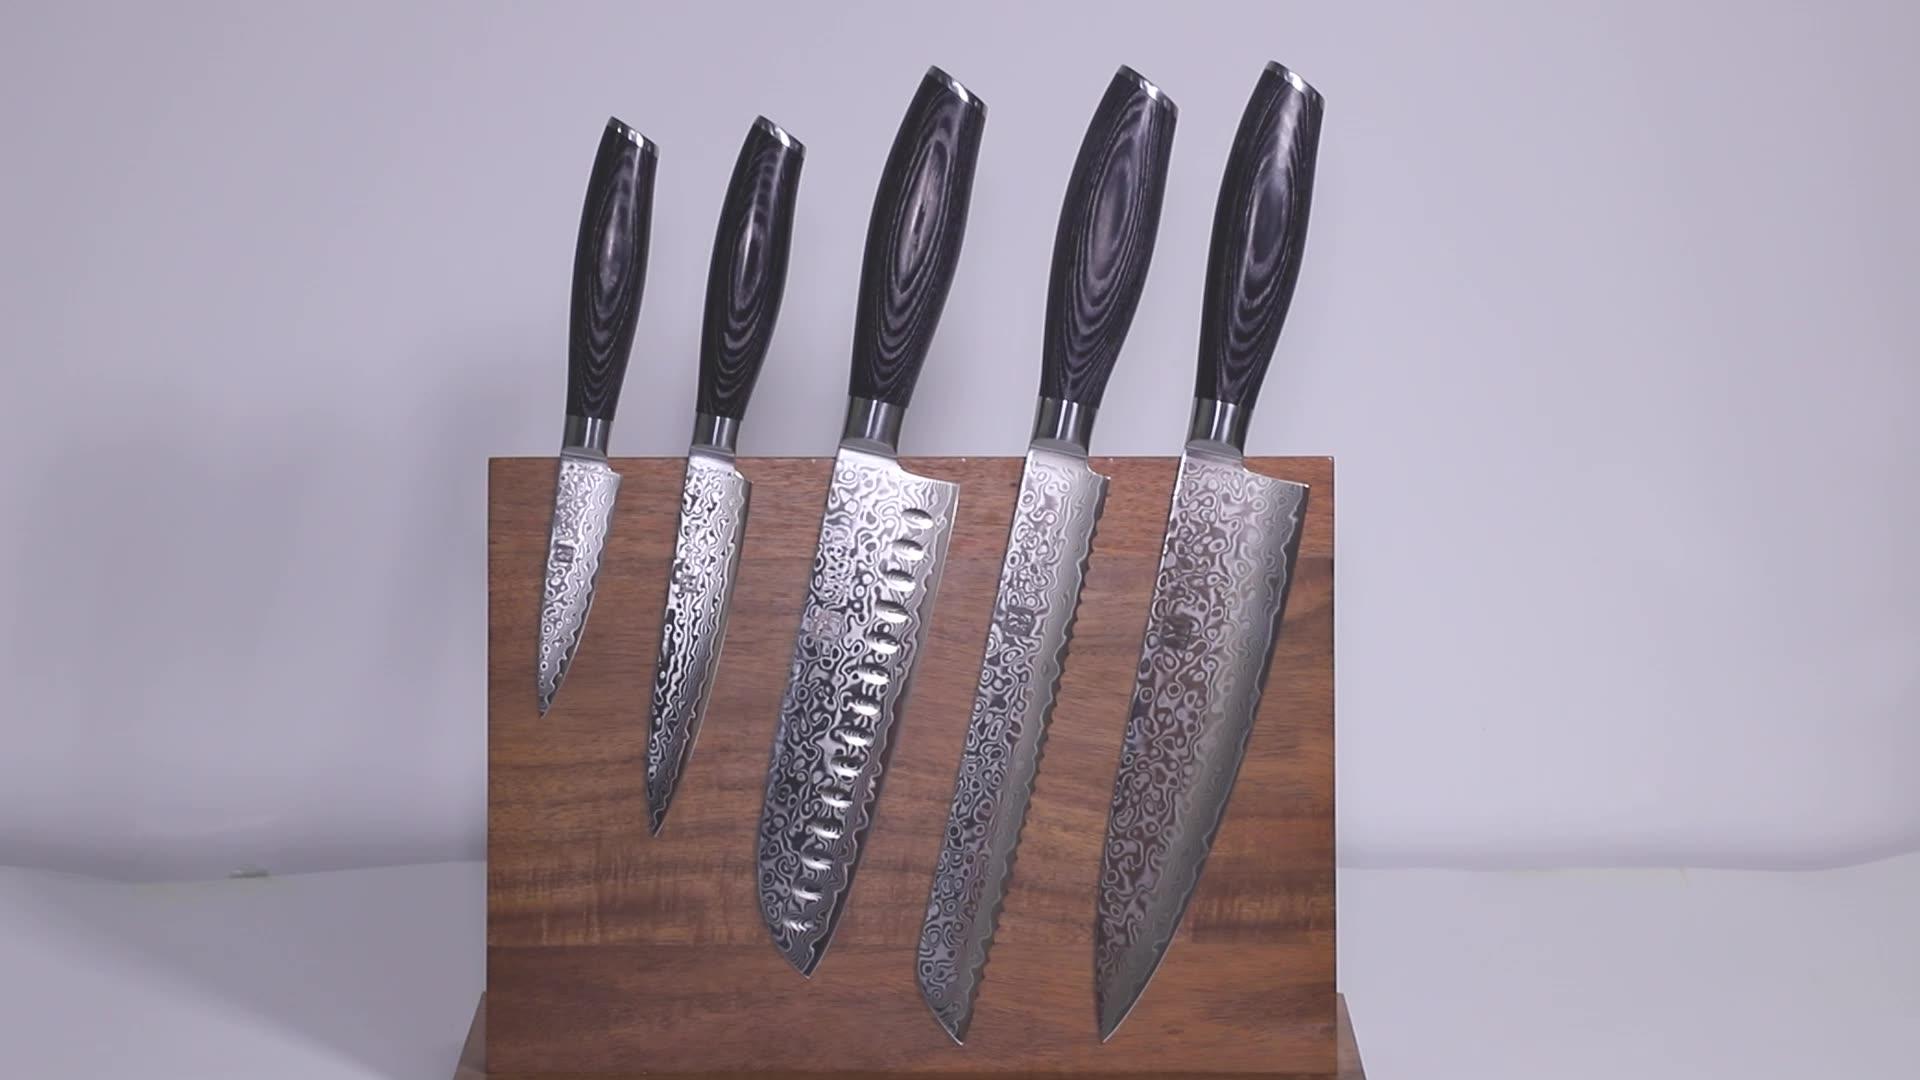 3.5inch Japanese Damascus steel paring kitchen knife